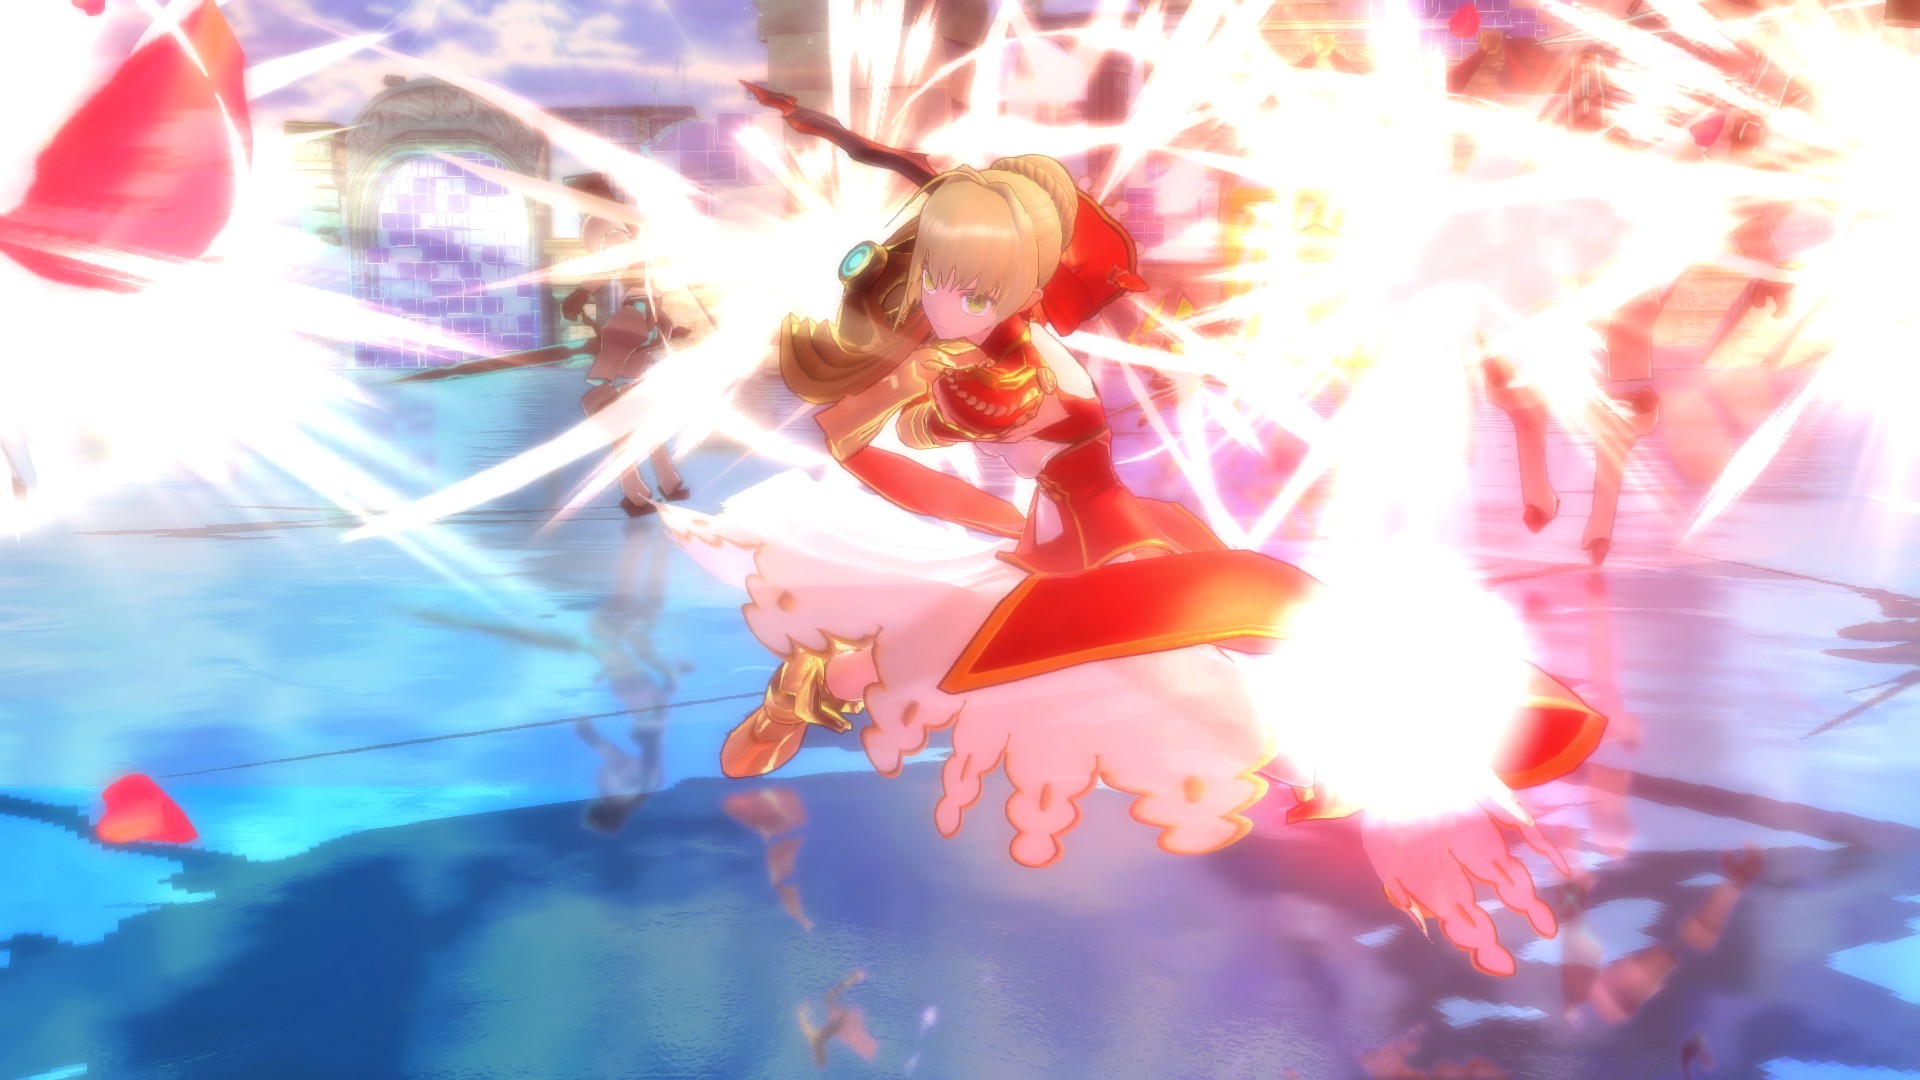 Fate/EXTELLA_body_2